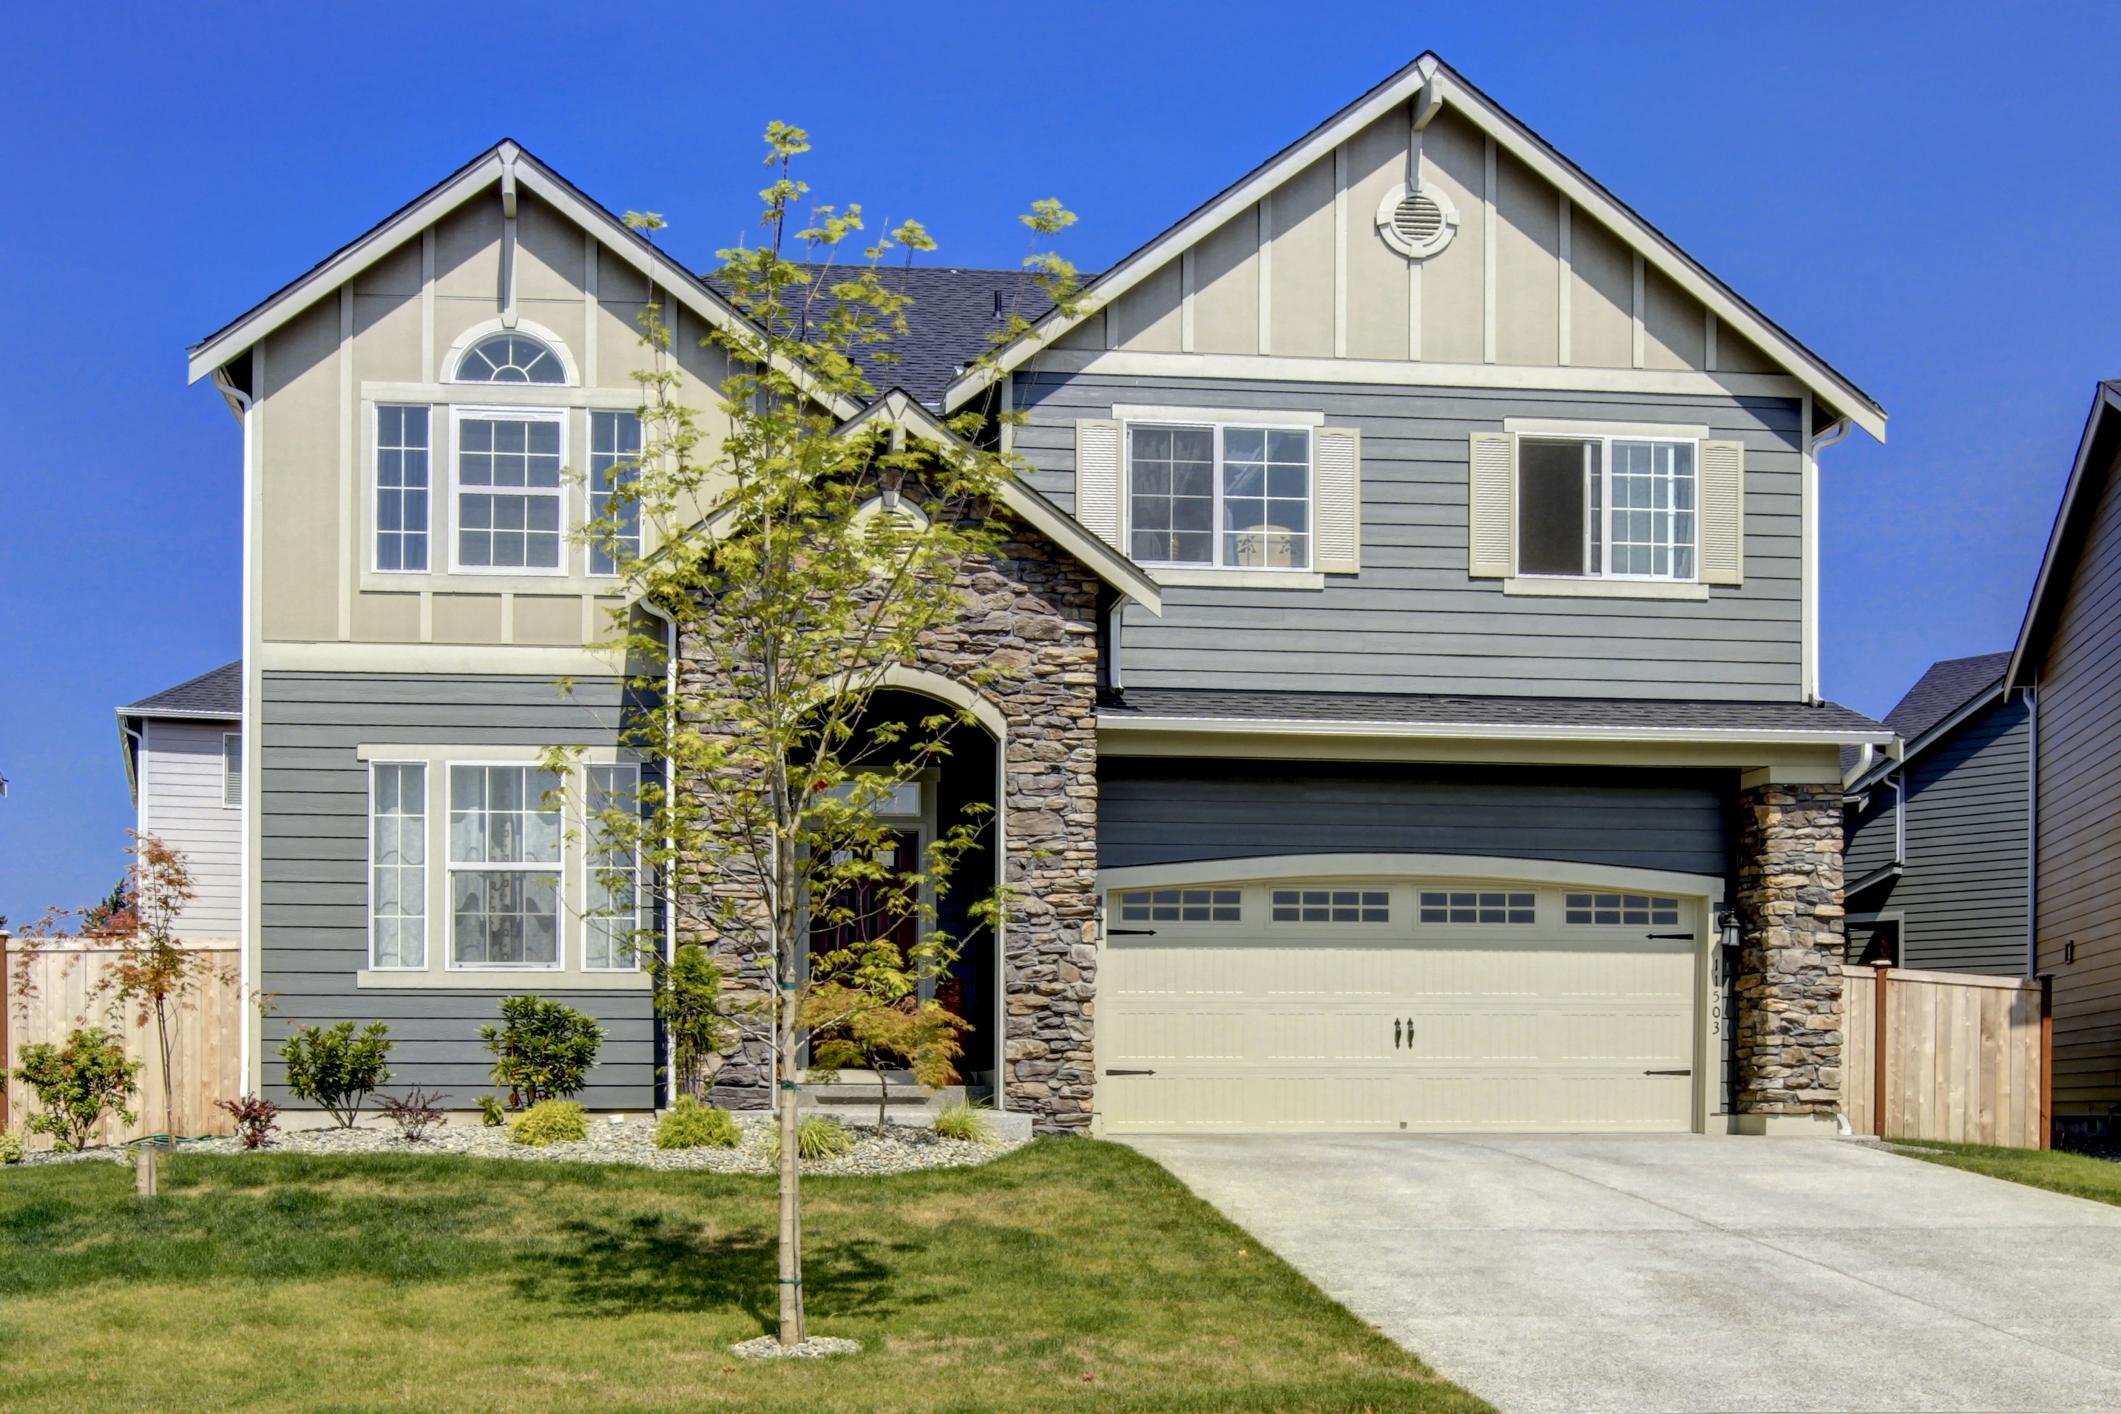 Sandblasting Spokane - Residential Sandblasting 1